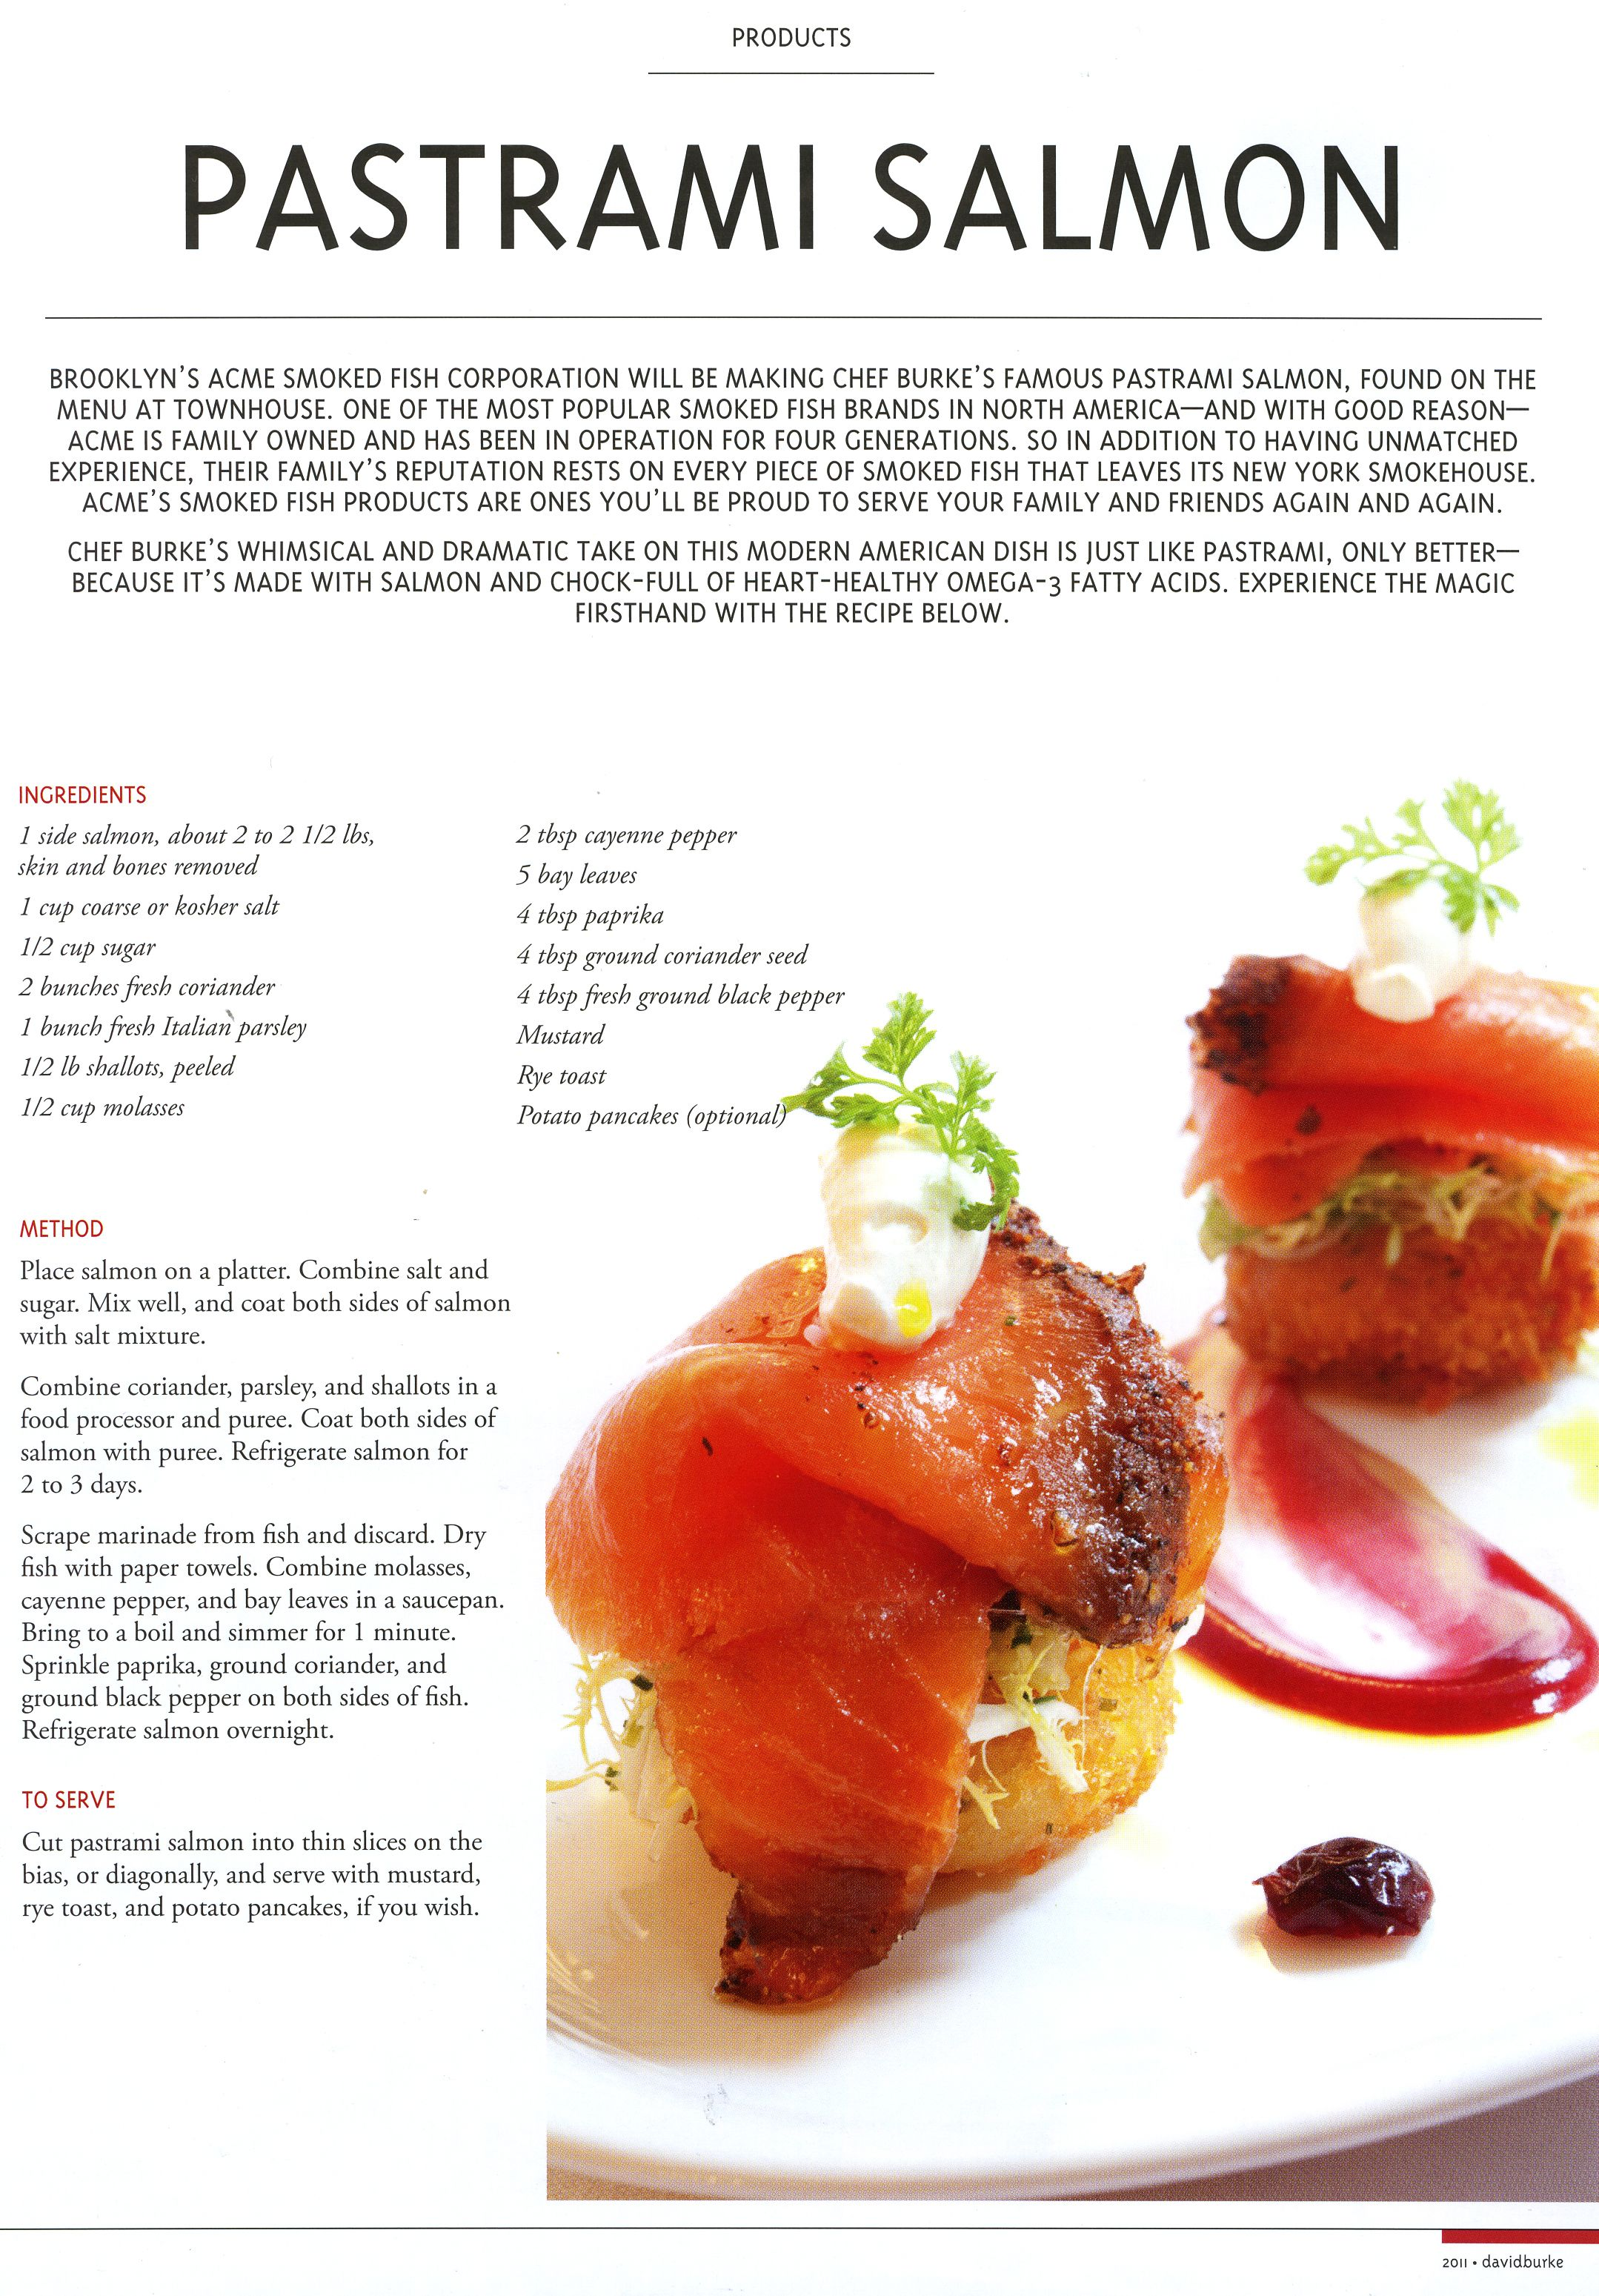 David Burke Pastrami Salmon! | Make Ahead Recipes | Pinterest